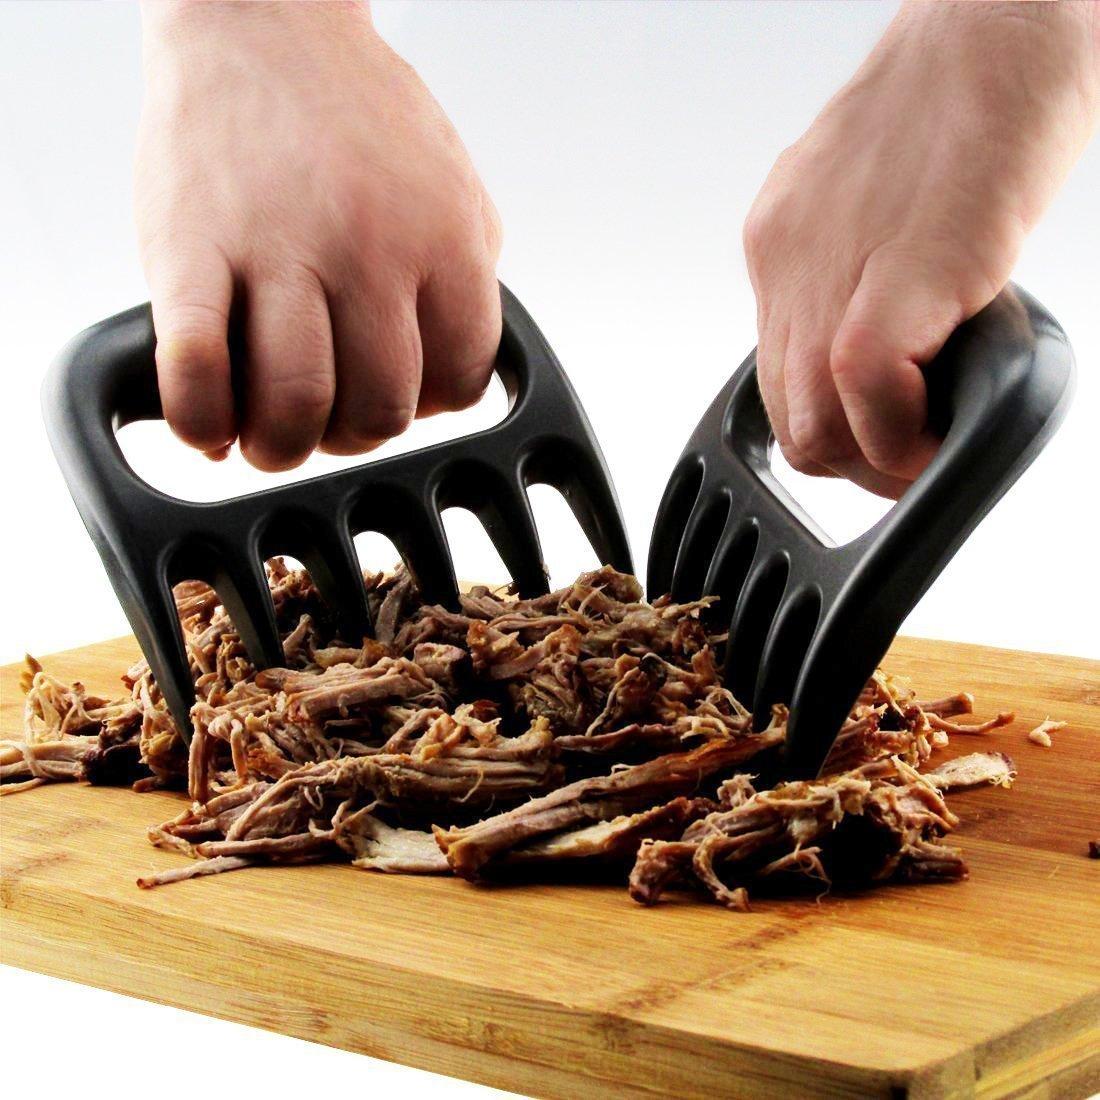 Kitchen Gadgets 1 Bear Claw Meat Shredder